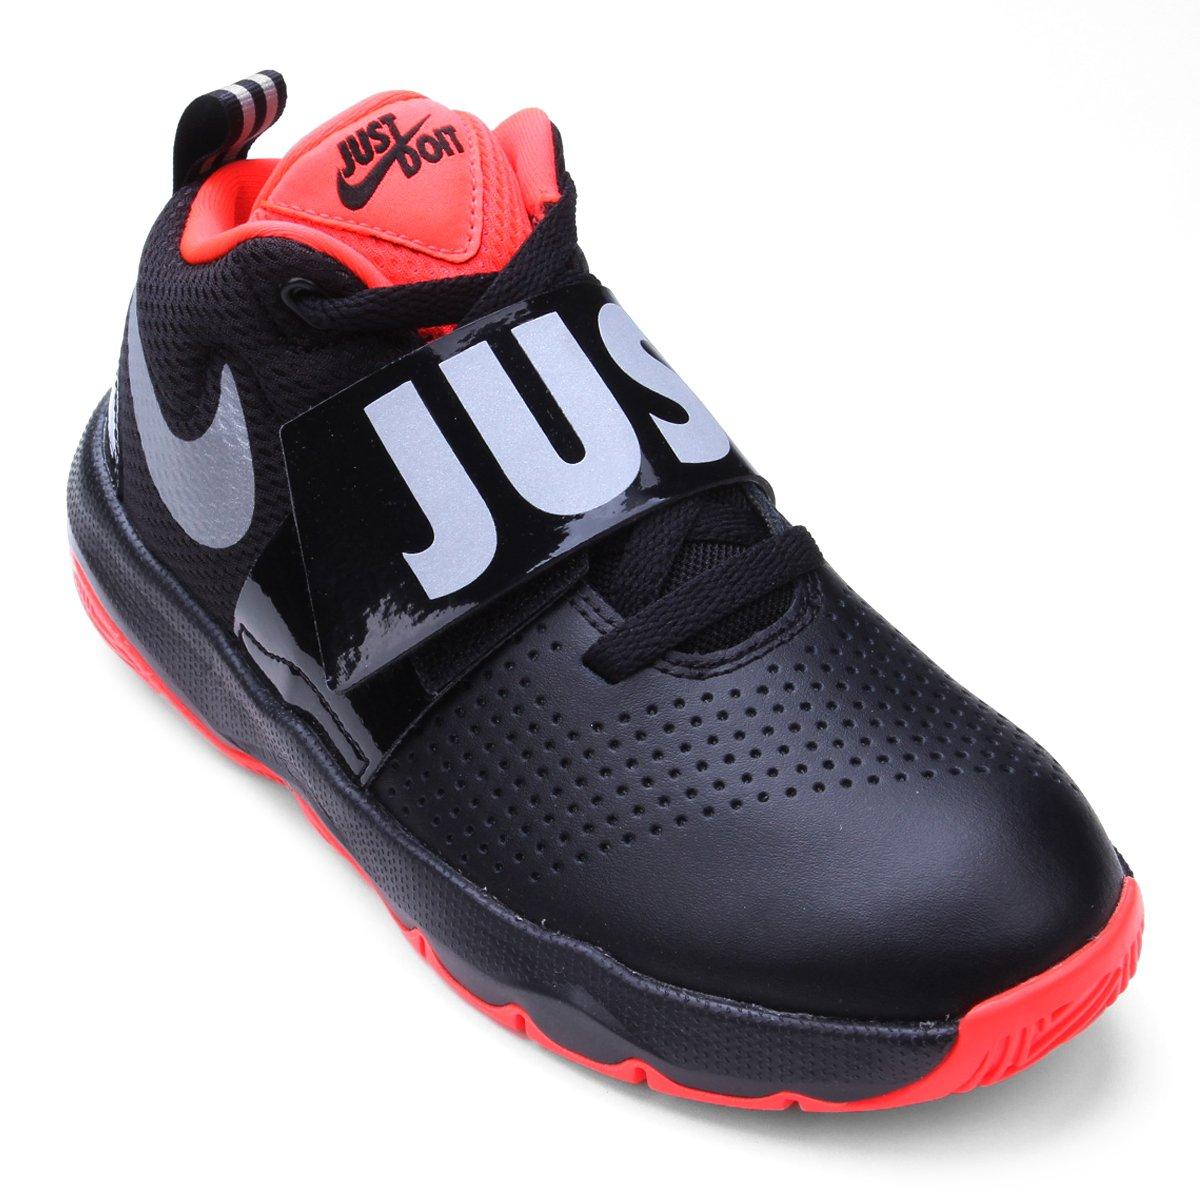 296fb237 Tênis Infantil Nike Team Hustle D 8 Jdi Bg - Preto e Prata | Shop Timão